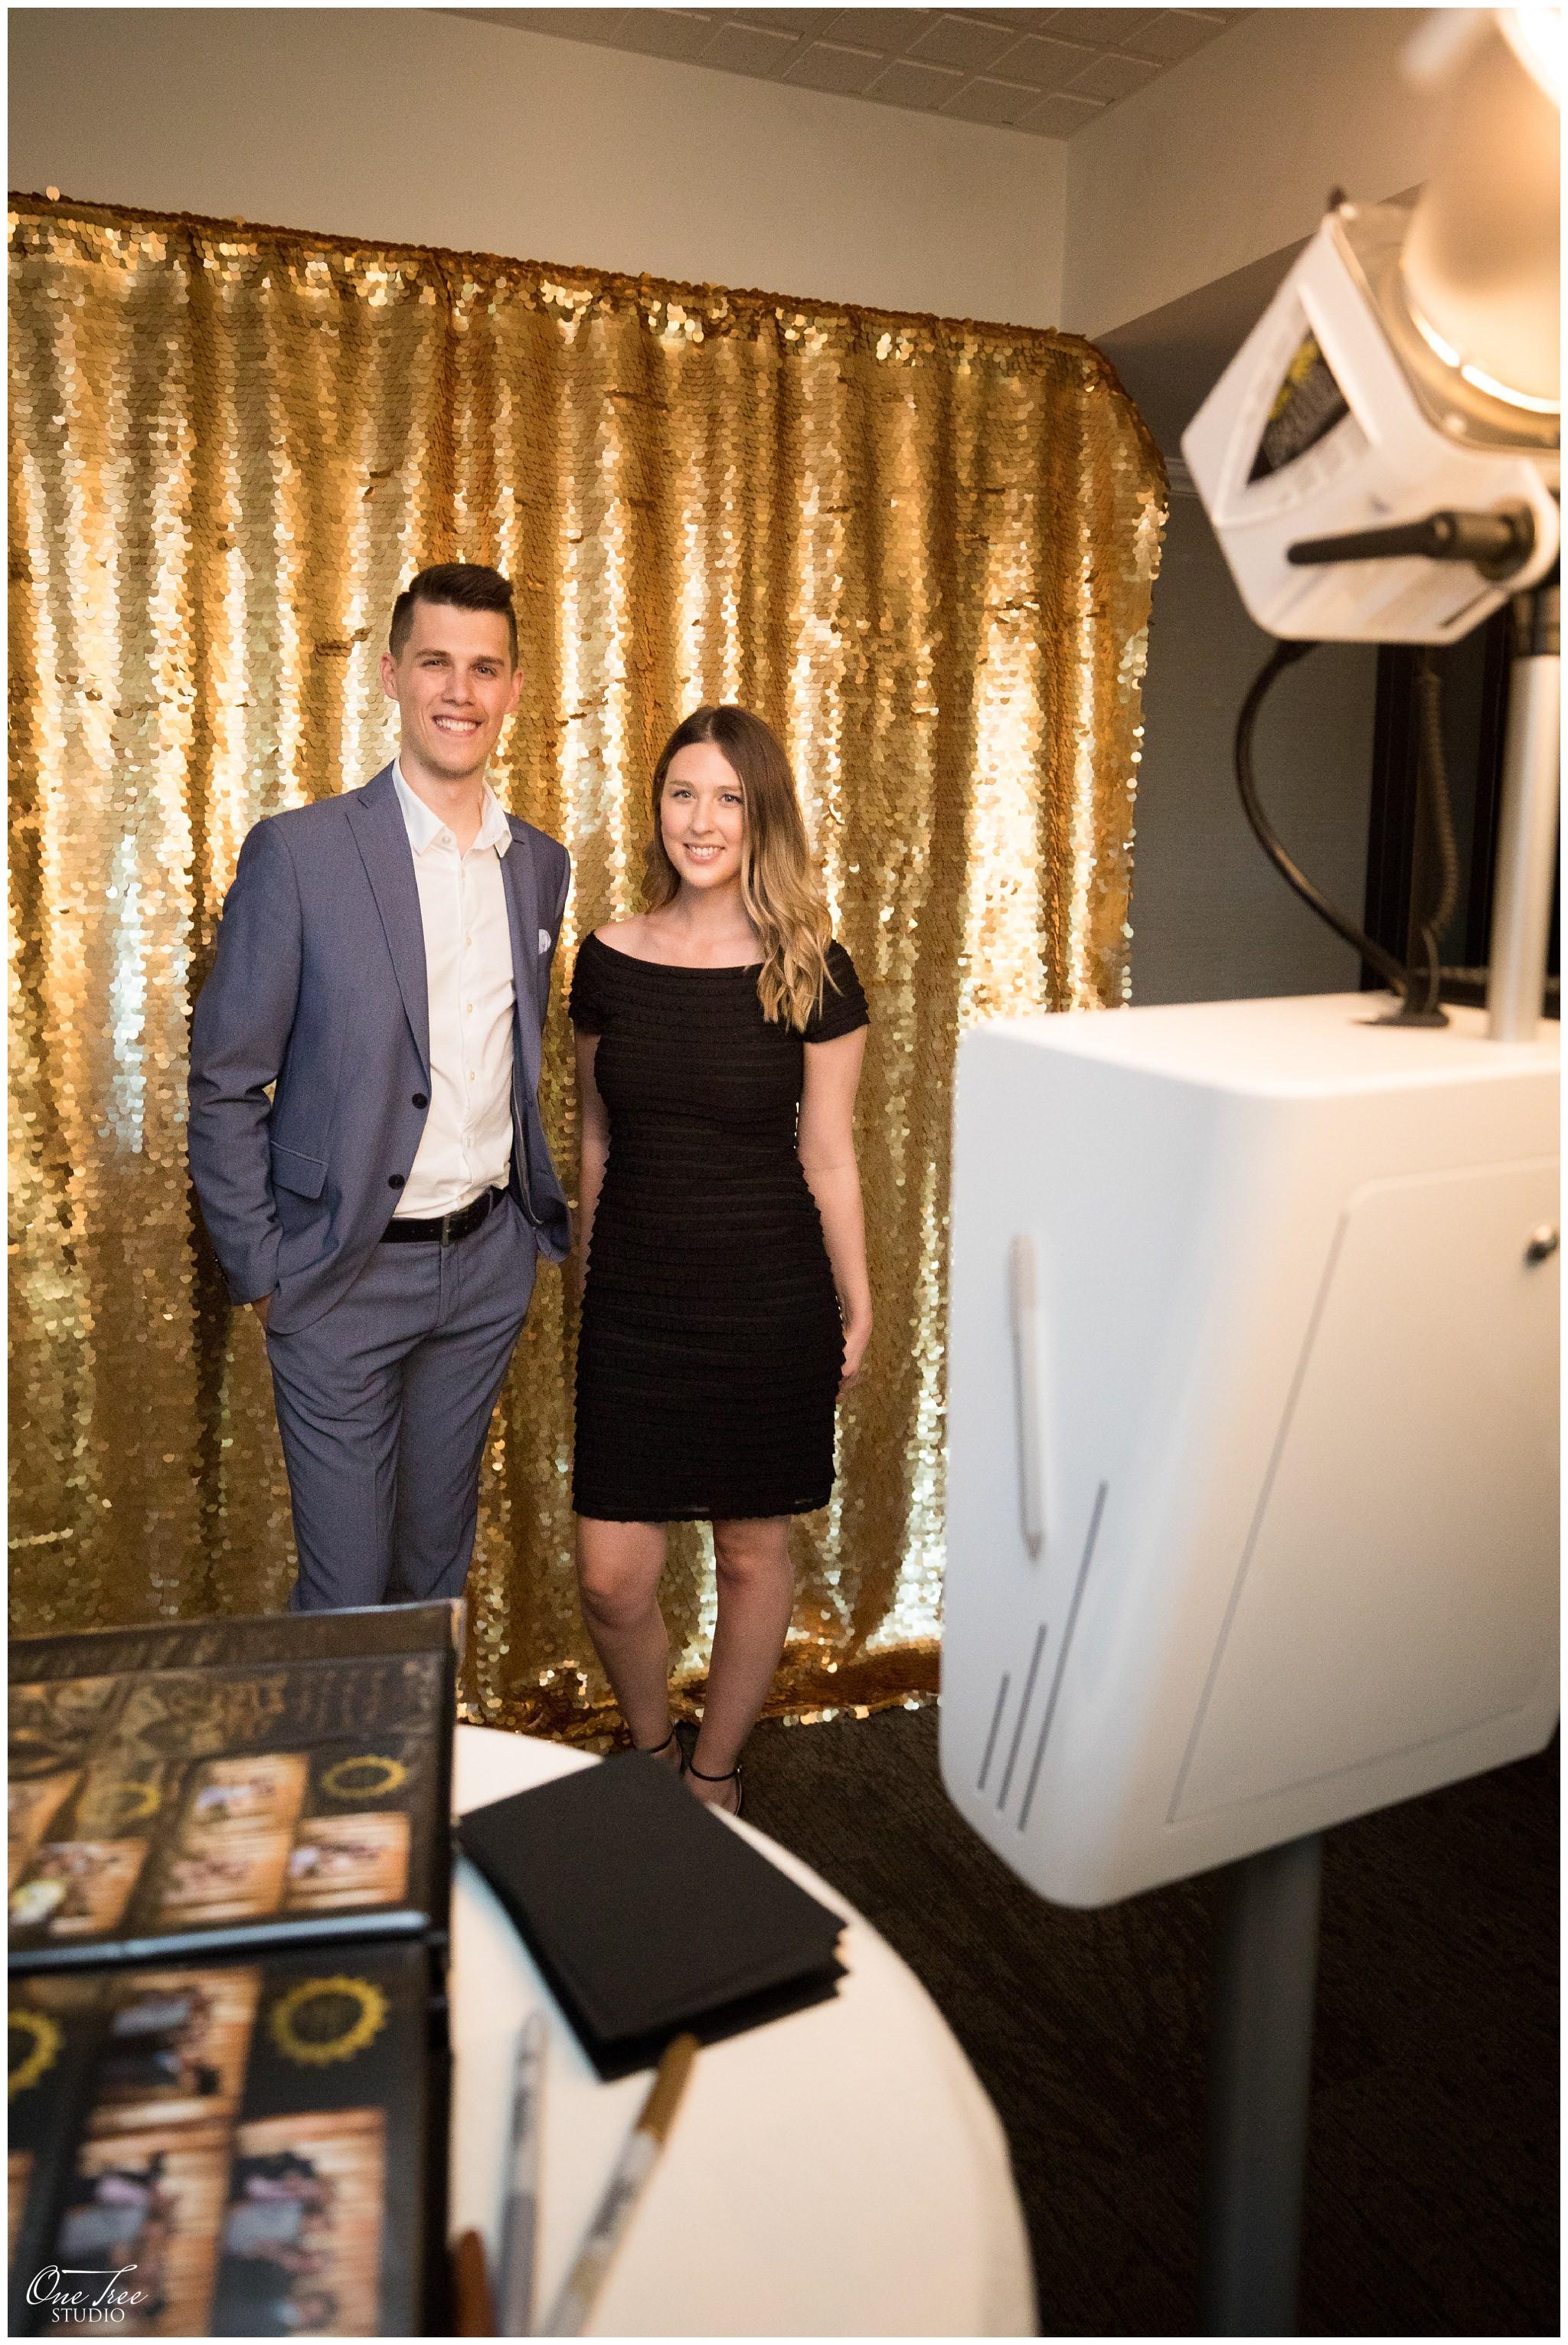 Toronto Luxury Photo Booth